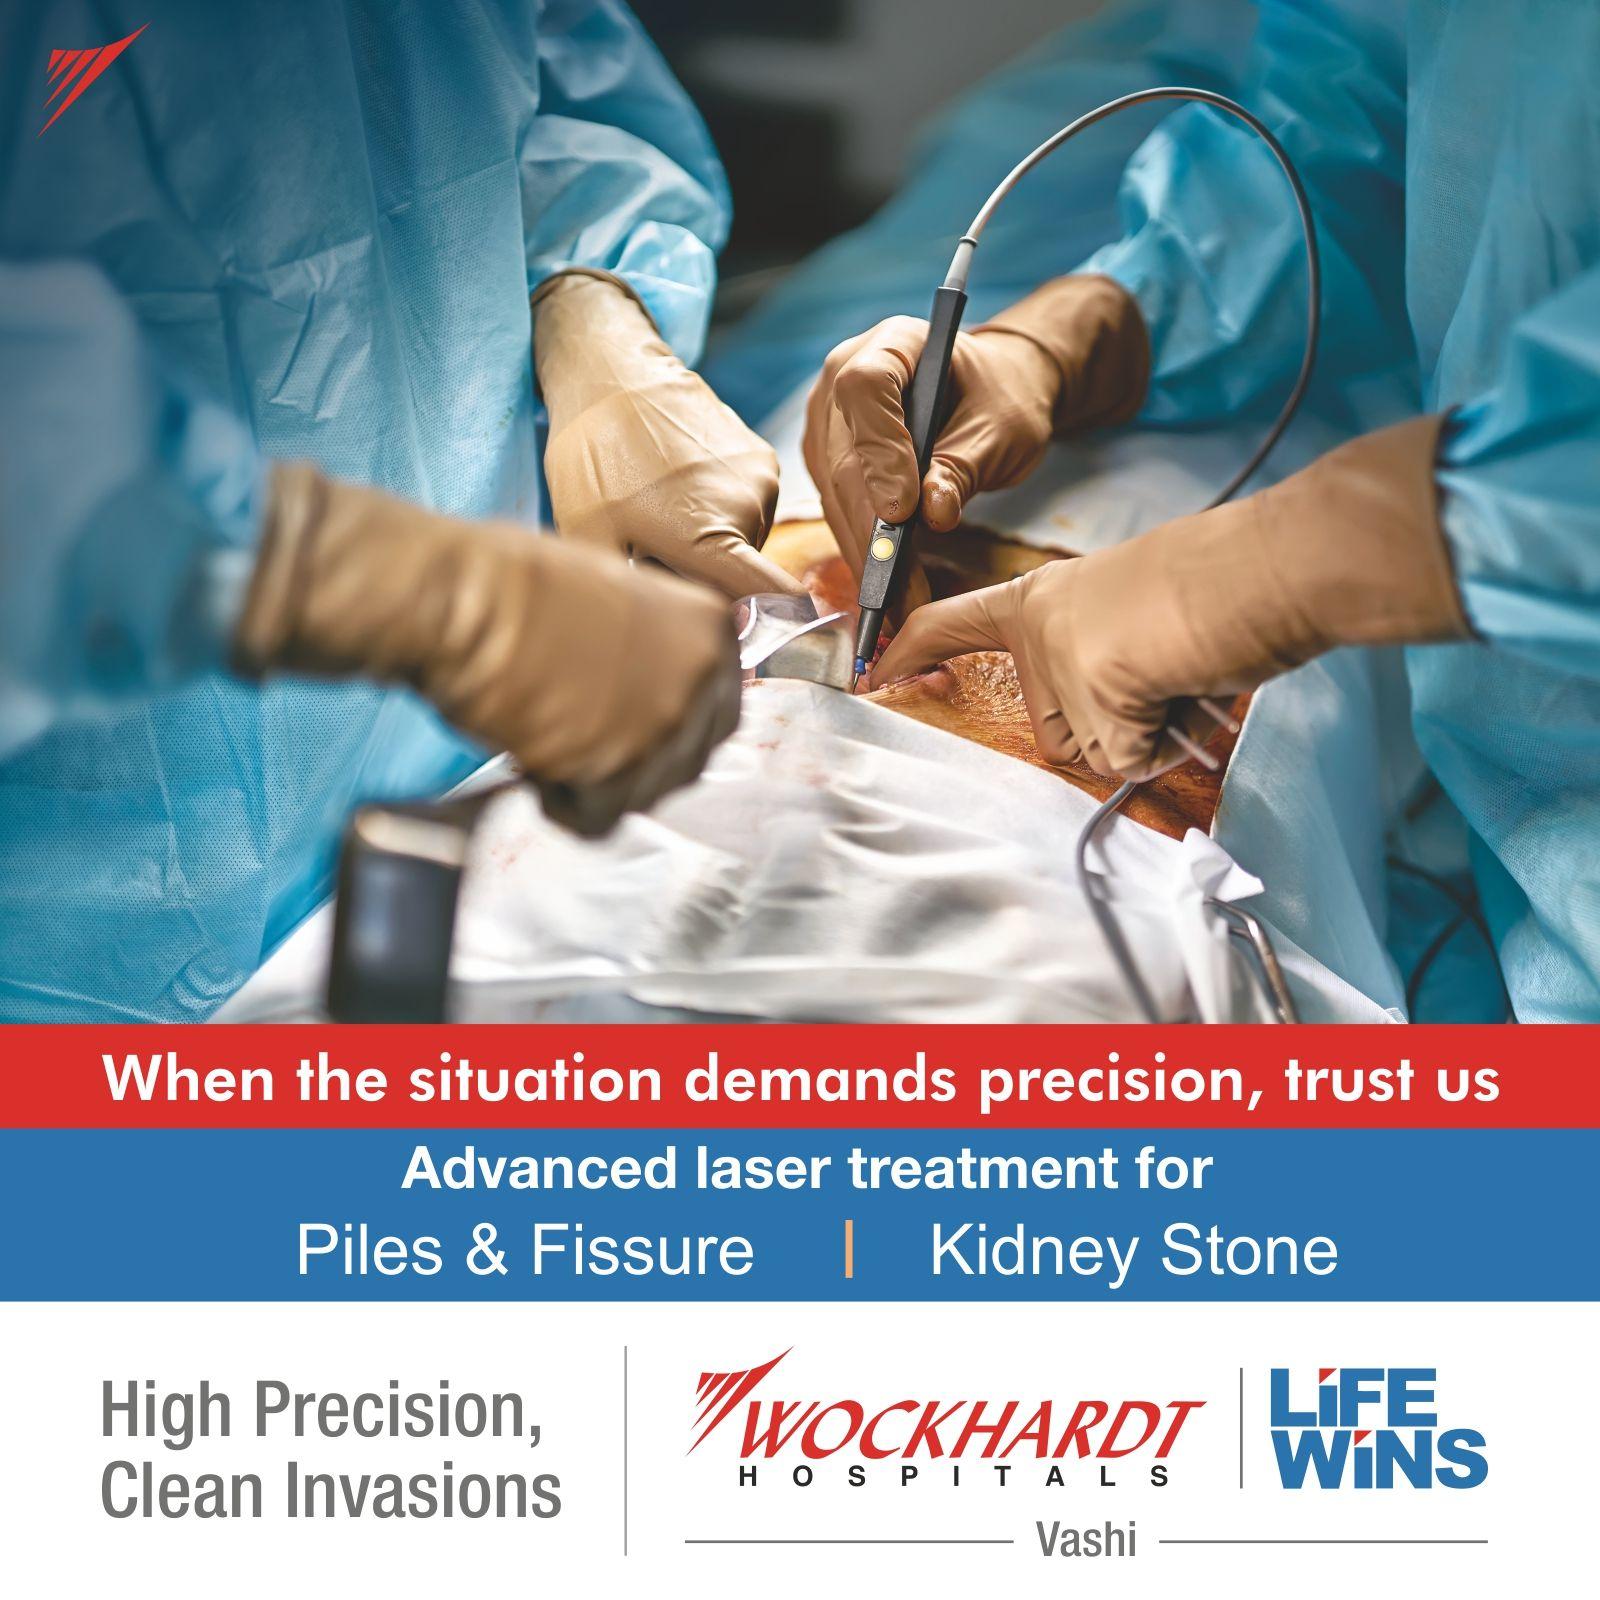 Advanced Laser Technology At Wockhardt Hospital Vashi Facilitates Piles Fissures Kidney Stone Removal Procedures Wi Laser Treatment Hospital Kidney Stones